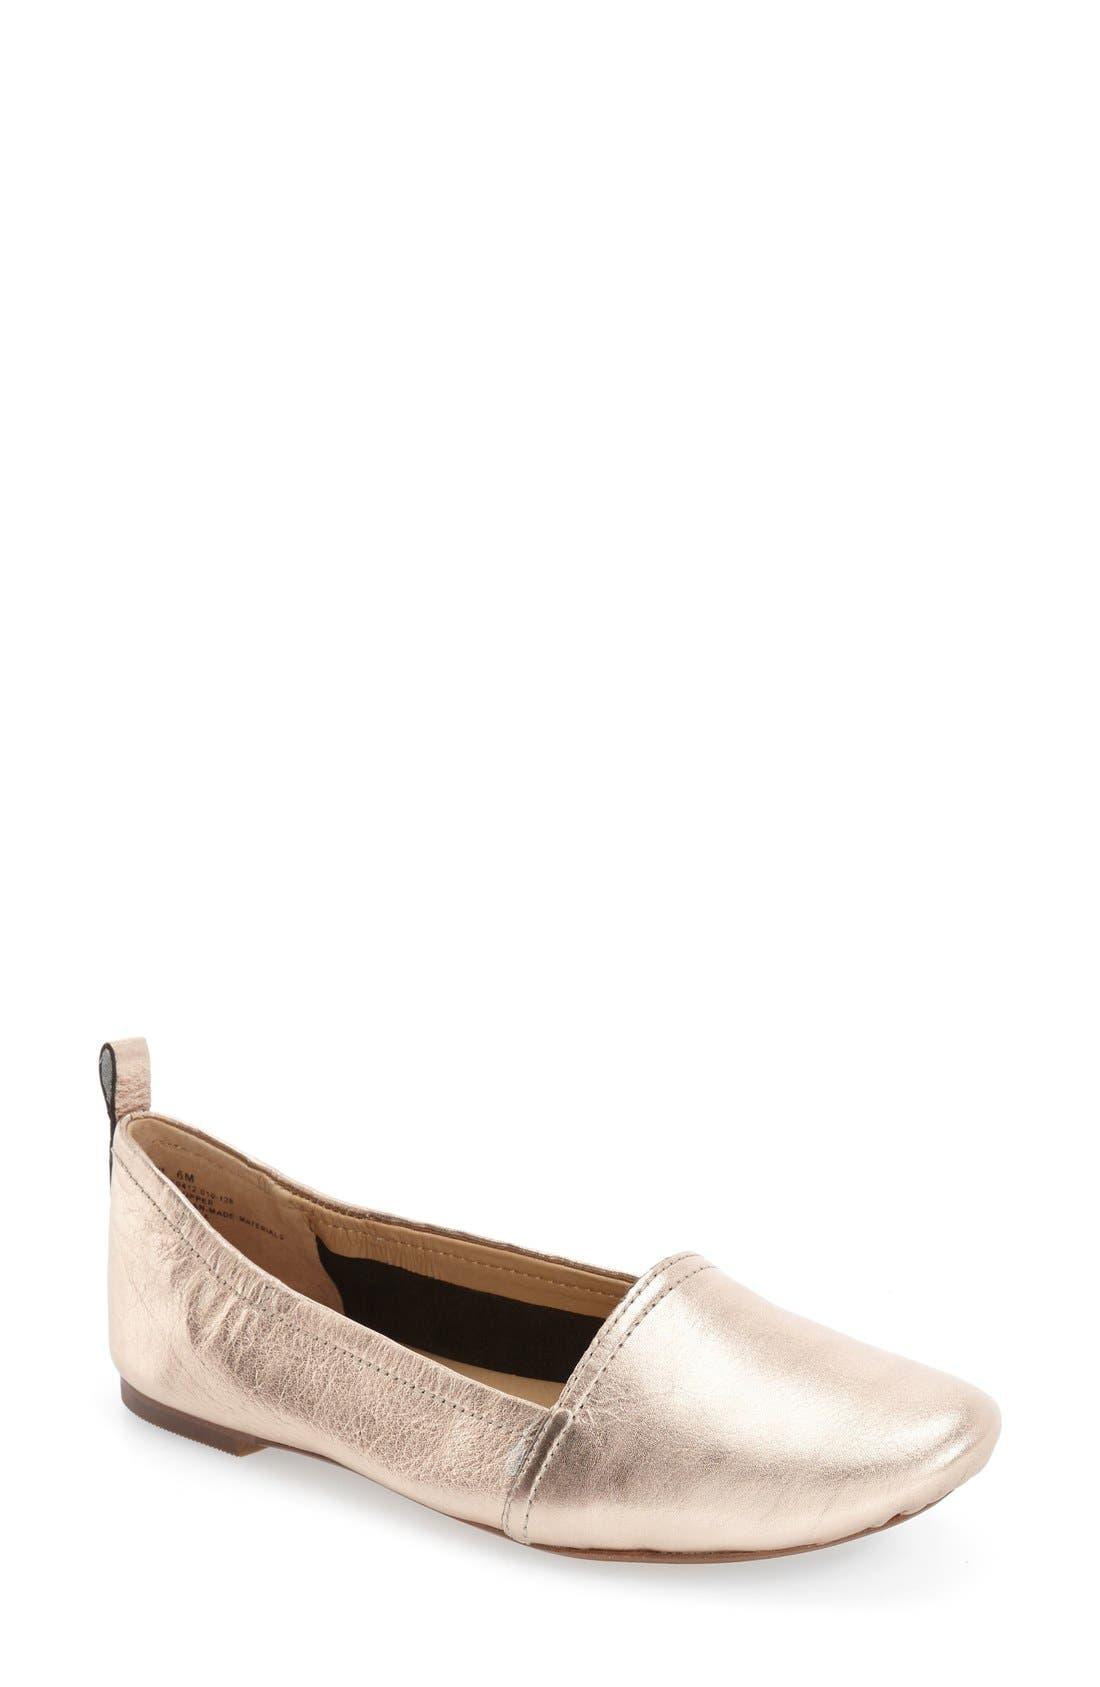 Alternate Image 1 Selected - Latigo 'Bettie' Leather Flat (Women)